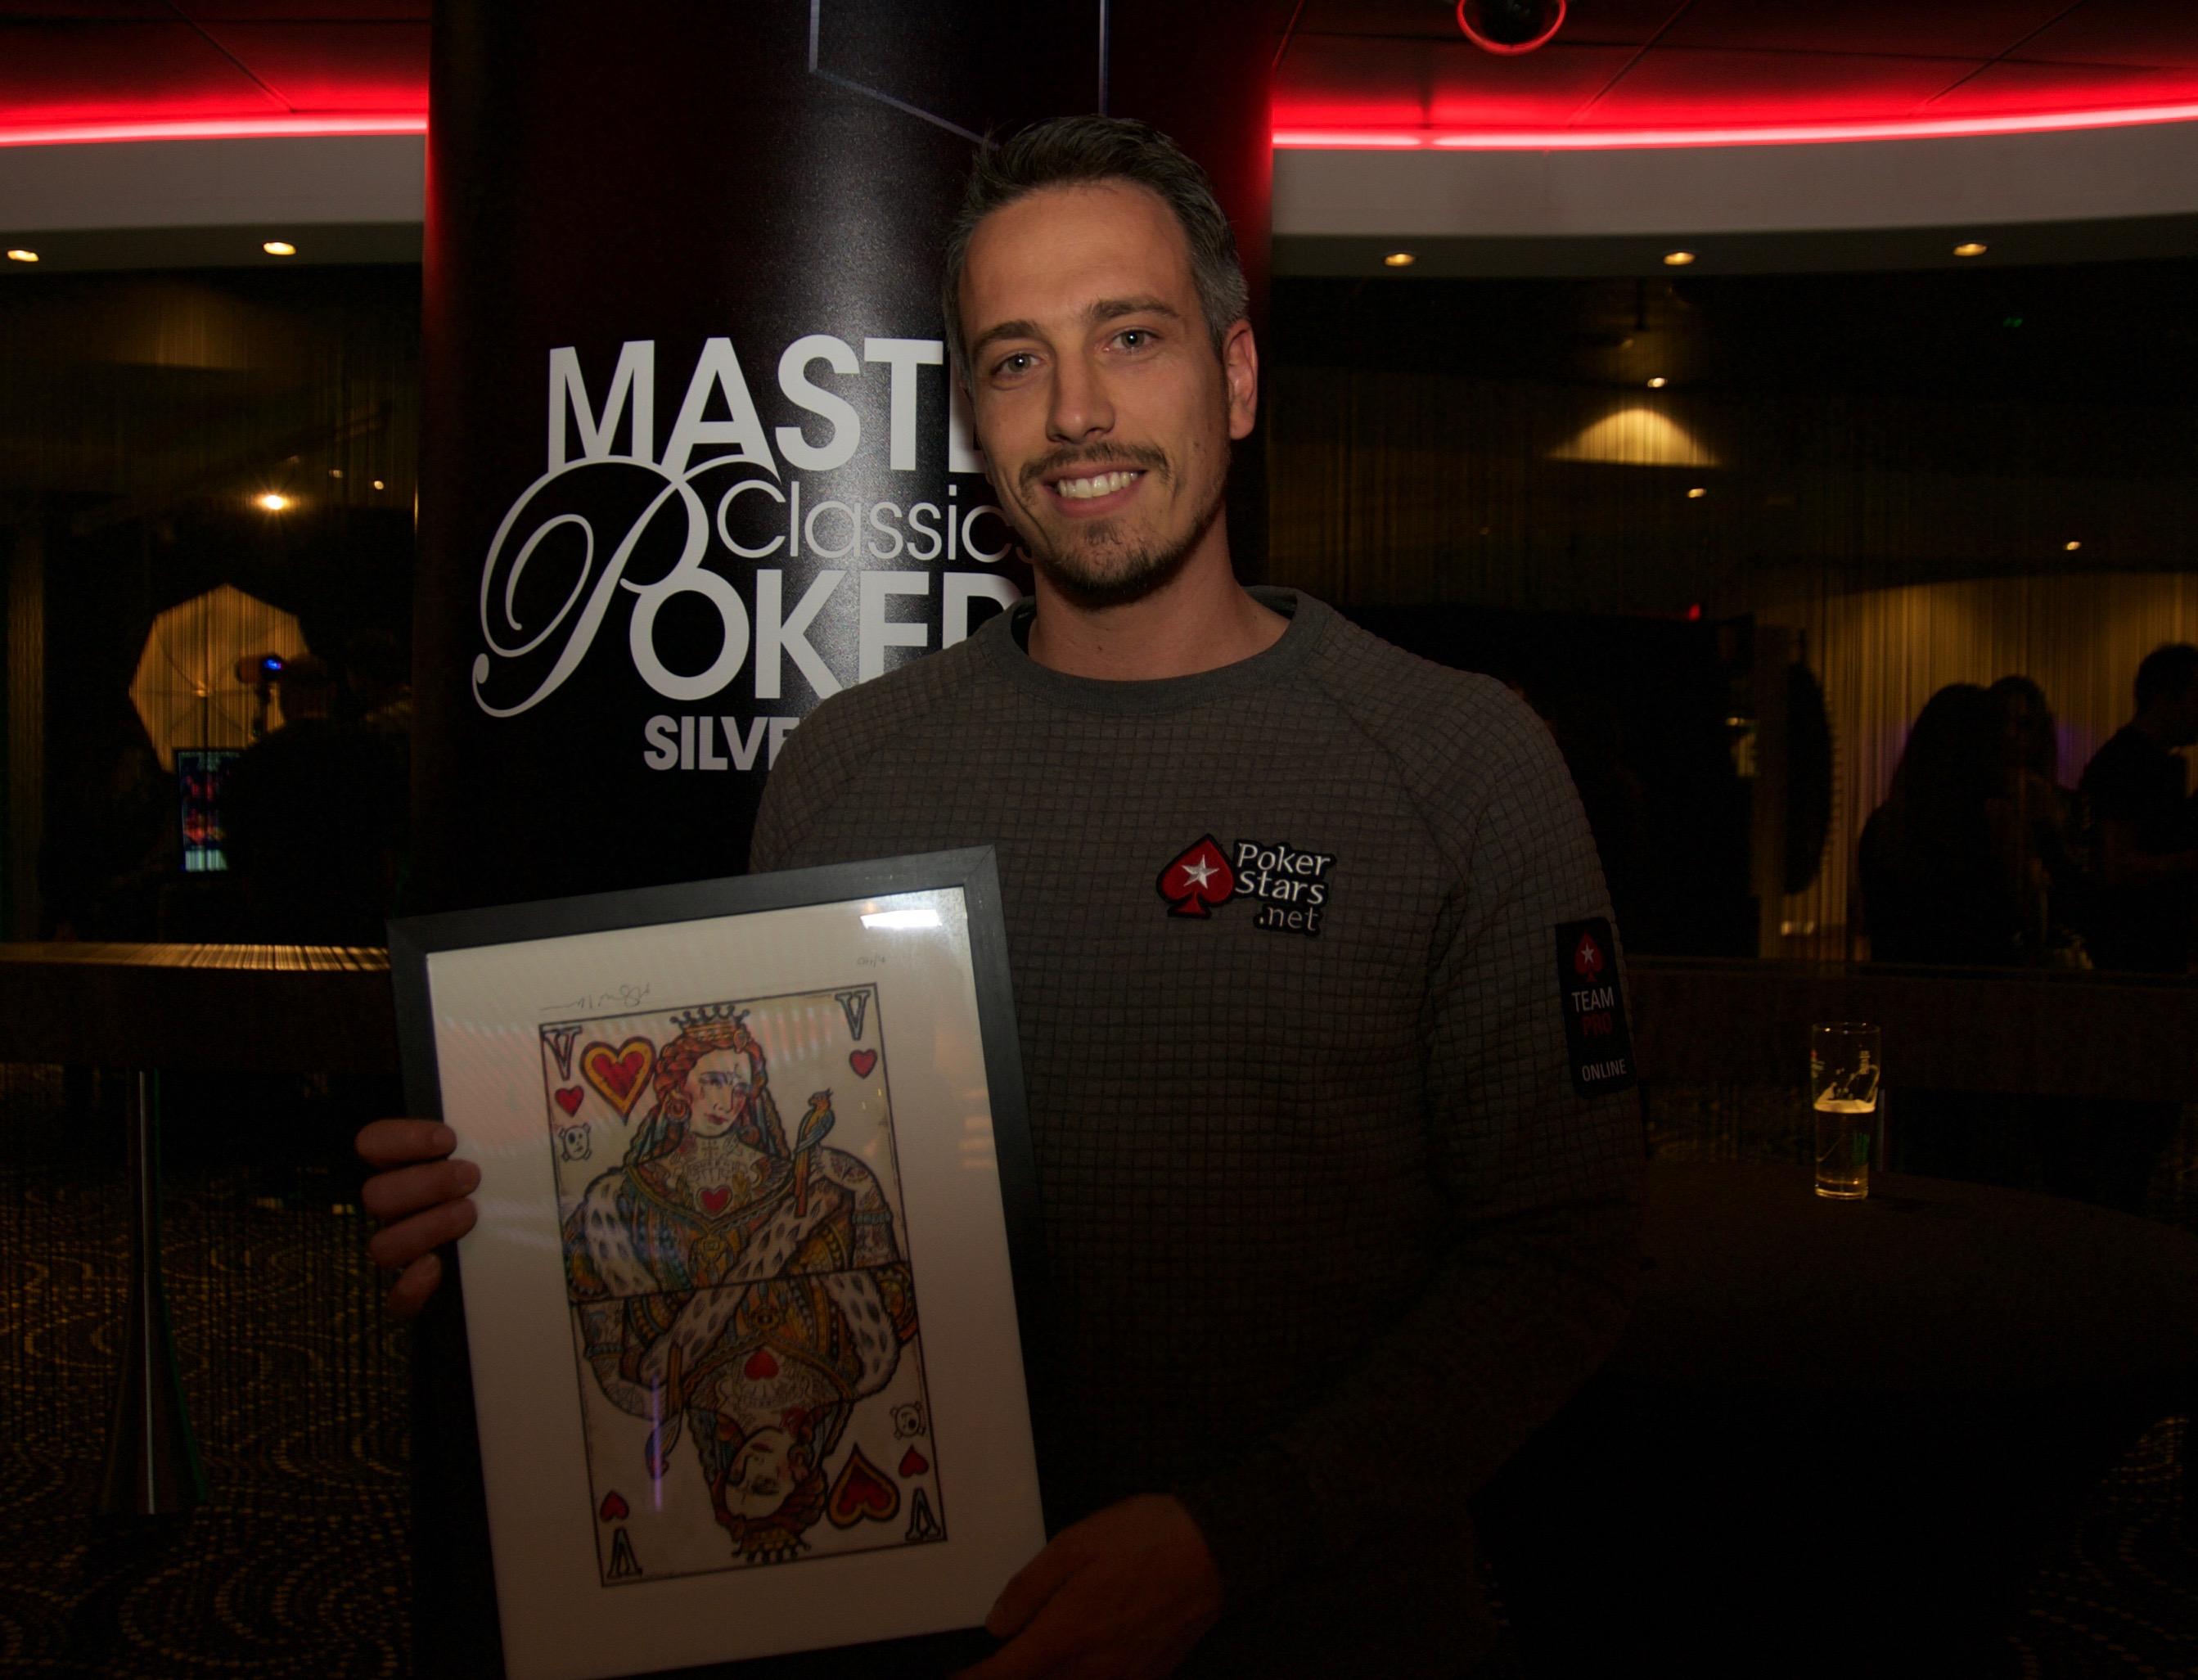 Rob Hollink, Lex Veldhuis en Peter Voolstra opgenomen in de Nederlandse Poker Hall of Fame 101